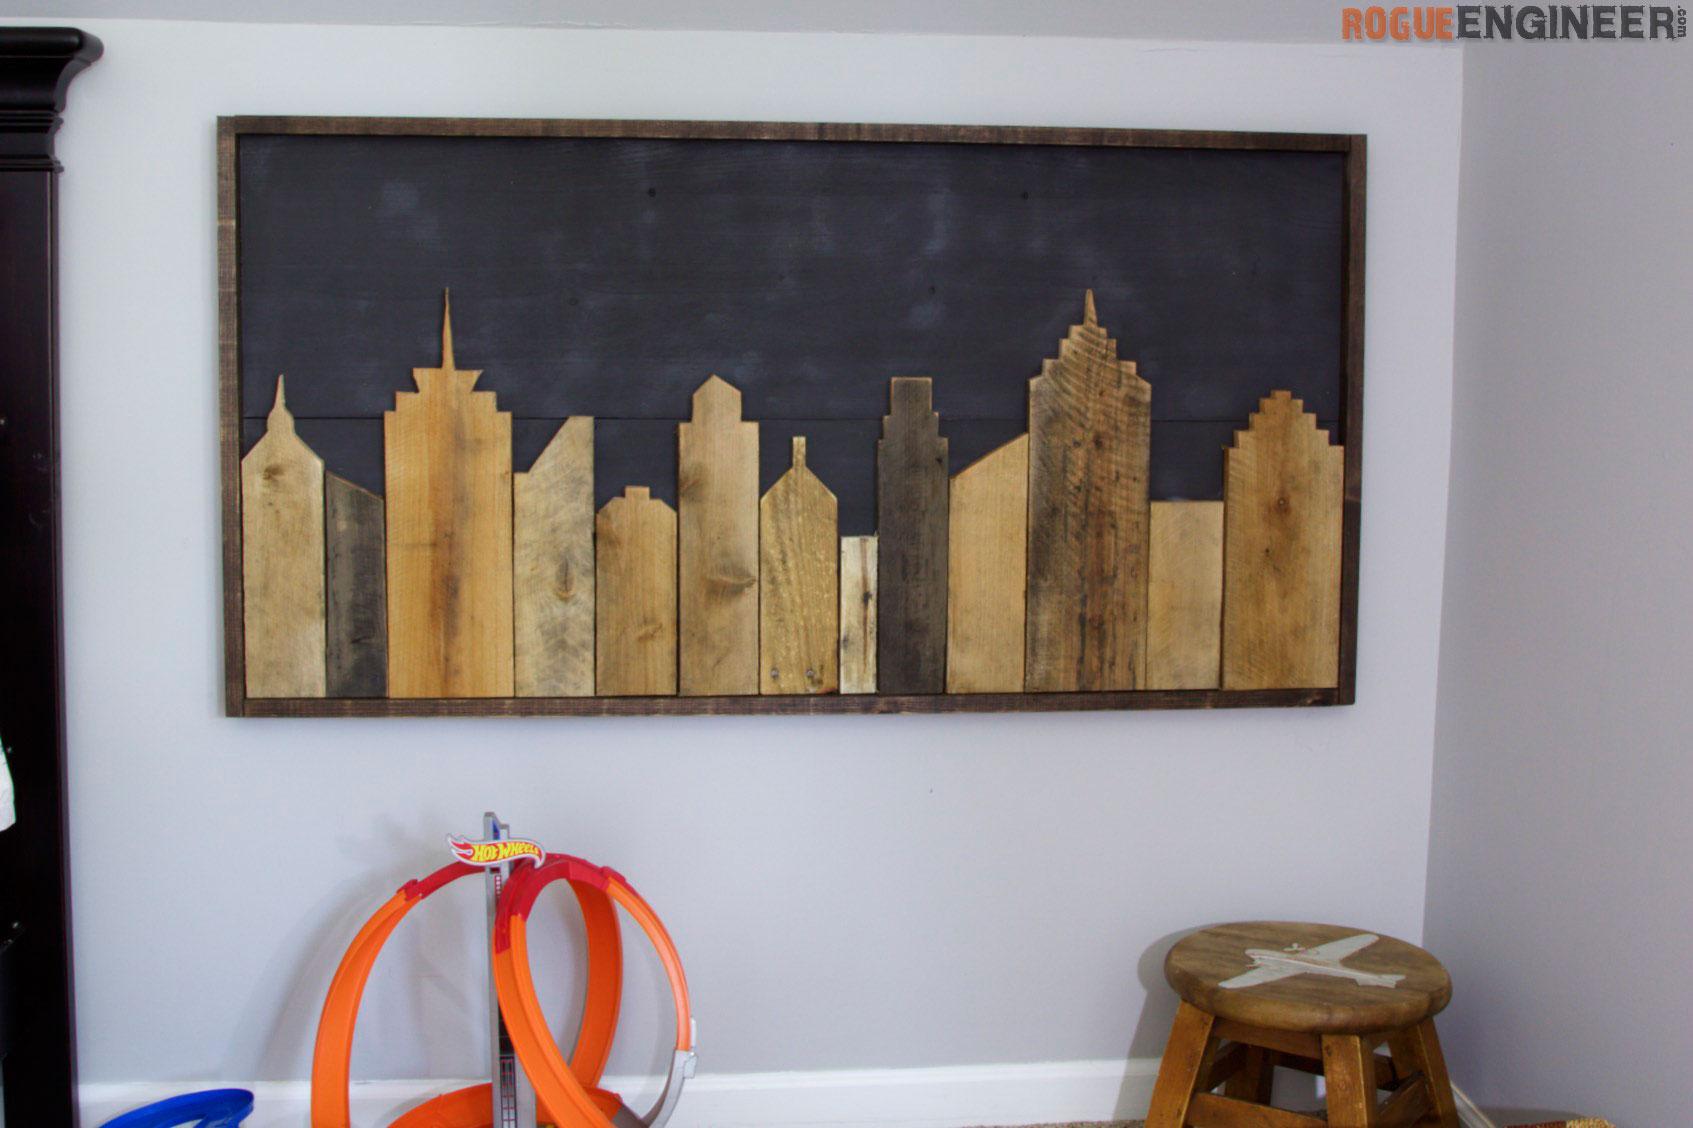 Cityscape Wall Art  Rogue Engineer